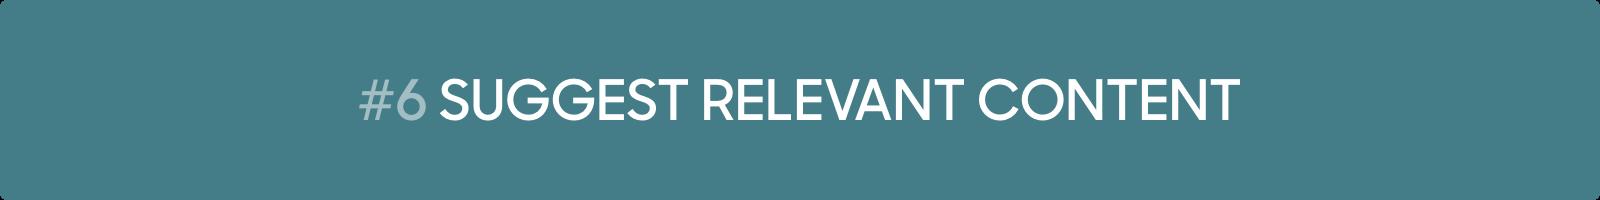 Conversational Marketing Tip #6: Suggest relevant content